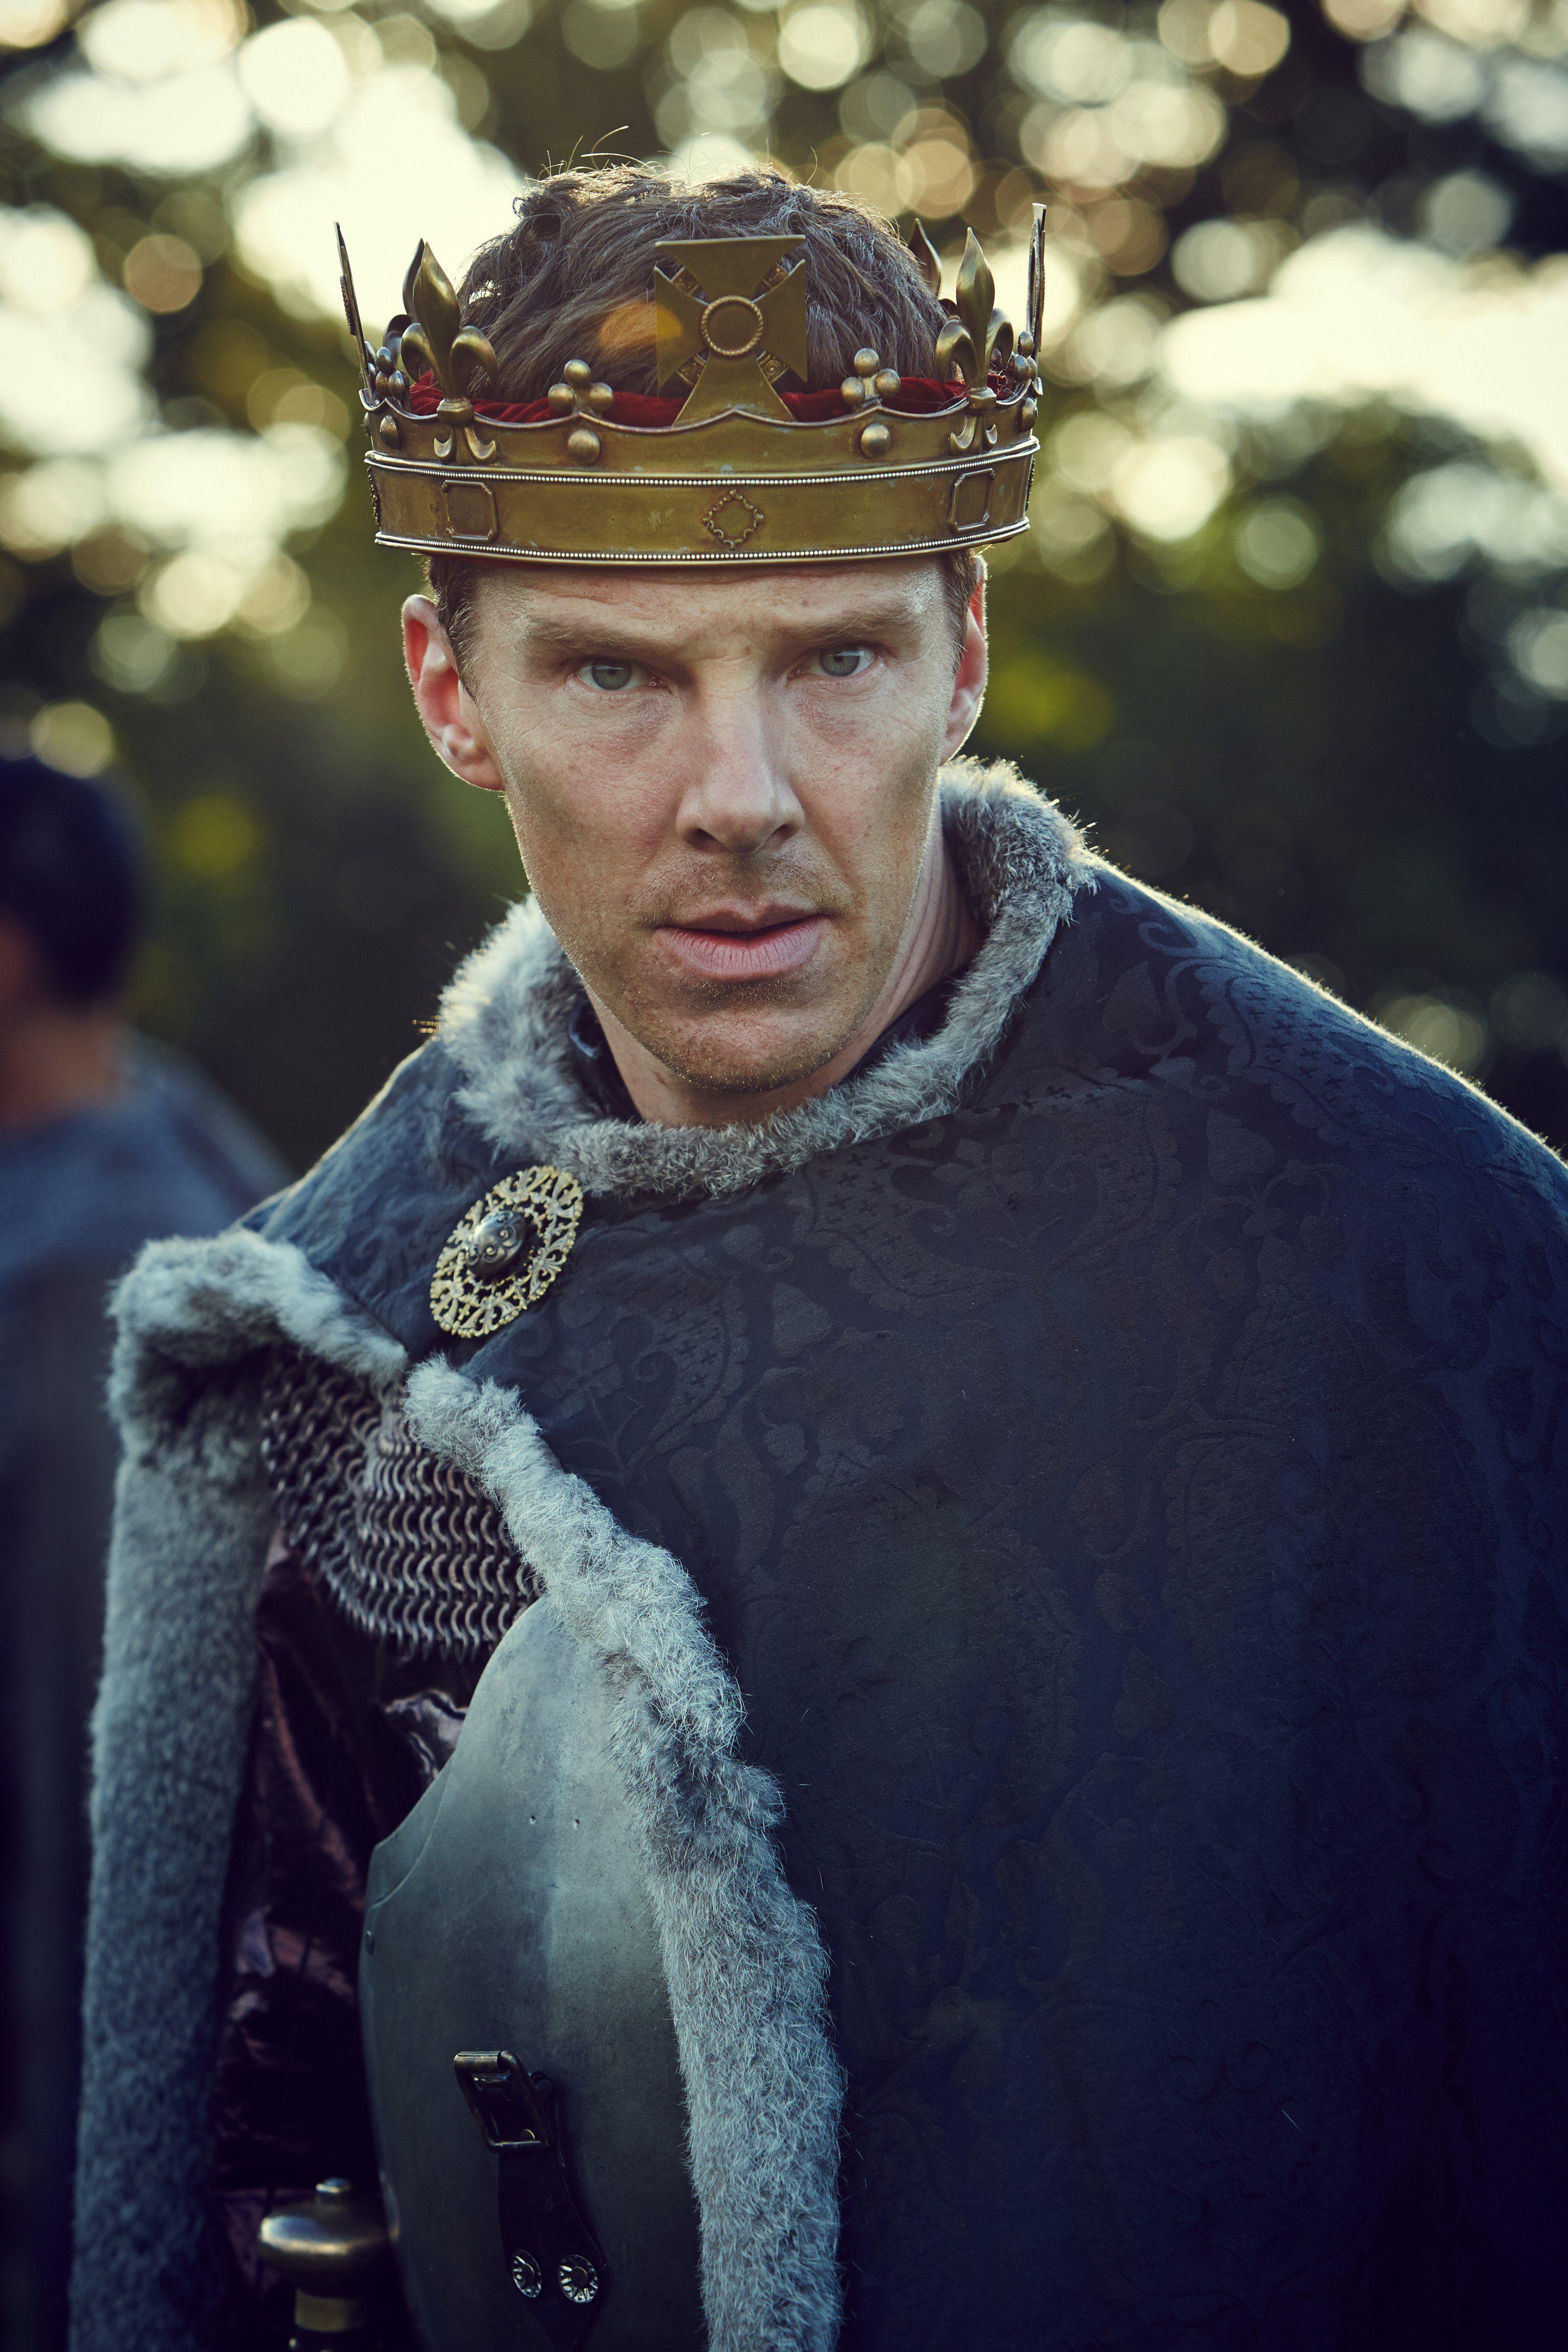 92eea54f822d3 The Hollow Crown - Richard III part - king Richard III   The Hollow ...